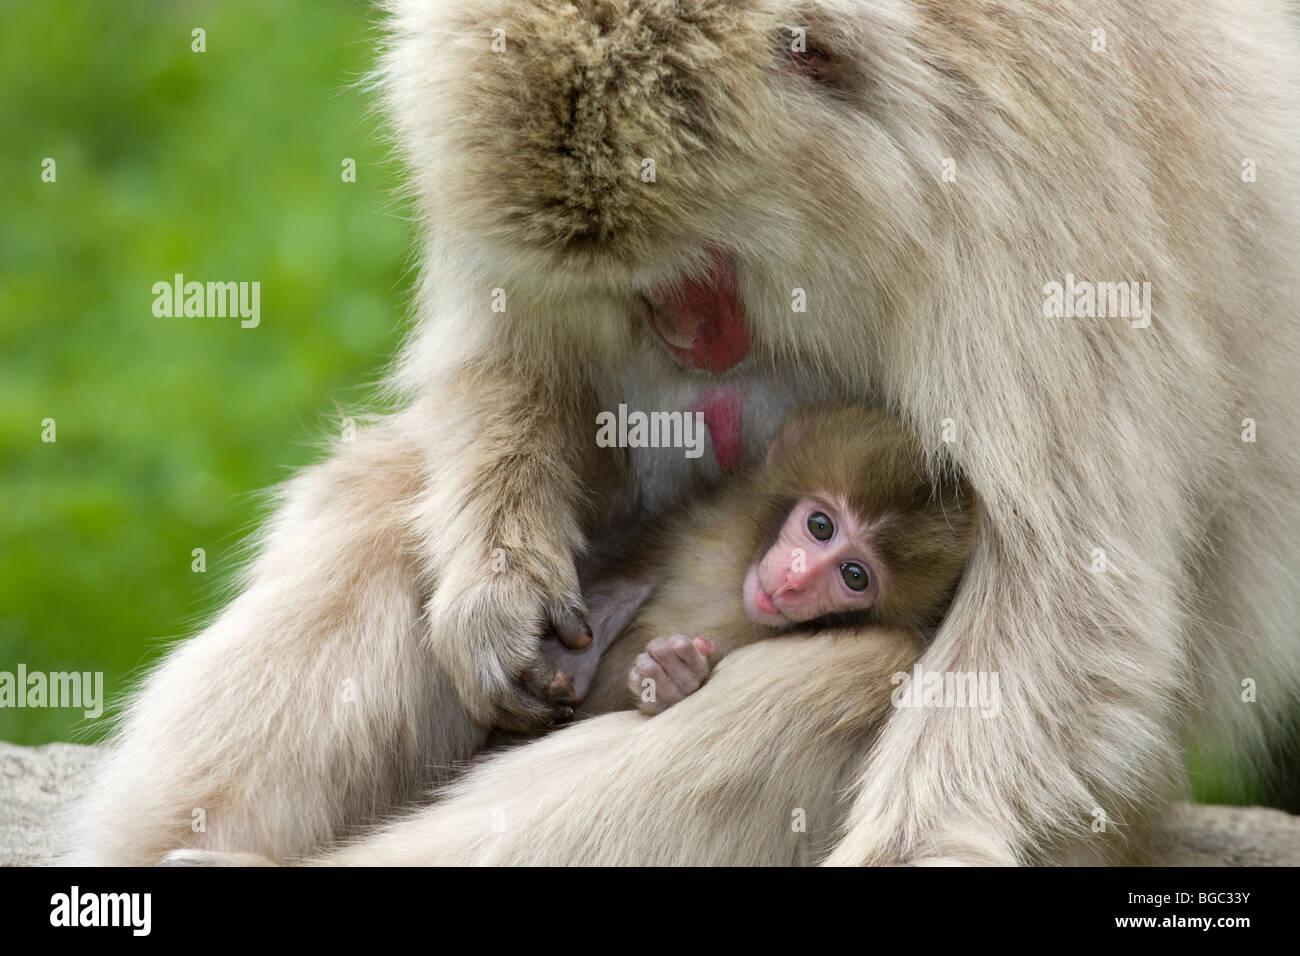 Macaque giapponese (Macaca fuscata) grooming Madre scimmia bambino Immagini Stock